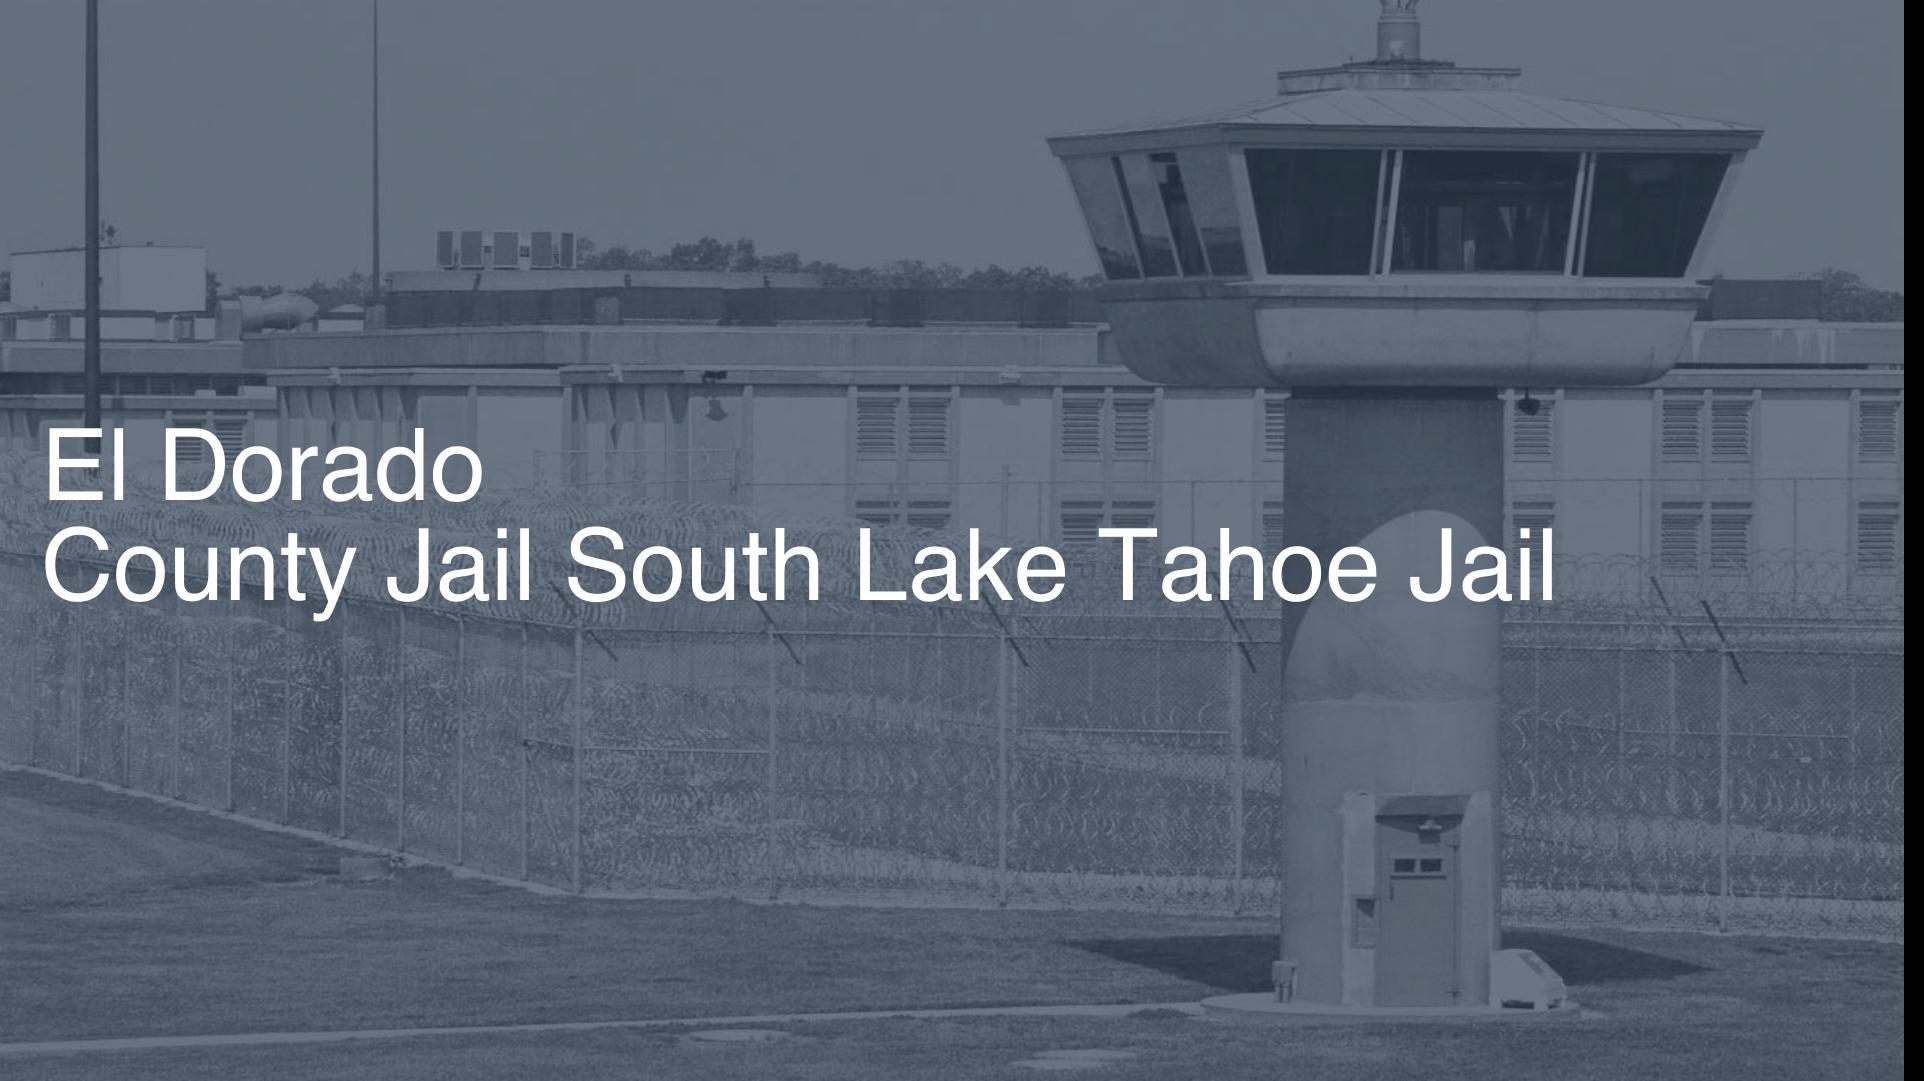 El Dorado County Jail - South Lake Tahoe Jail correctional facility picture